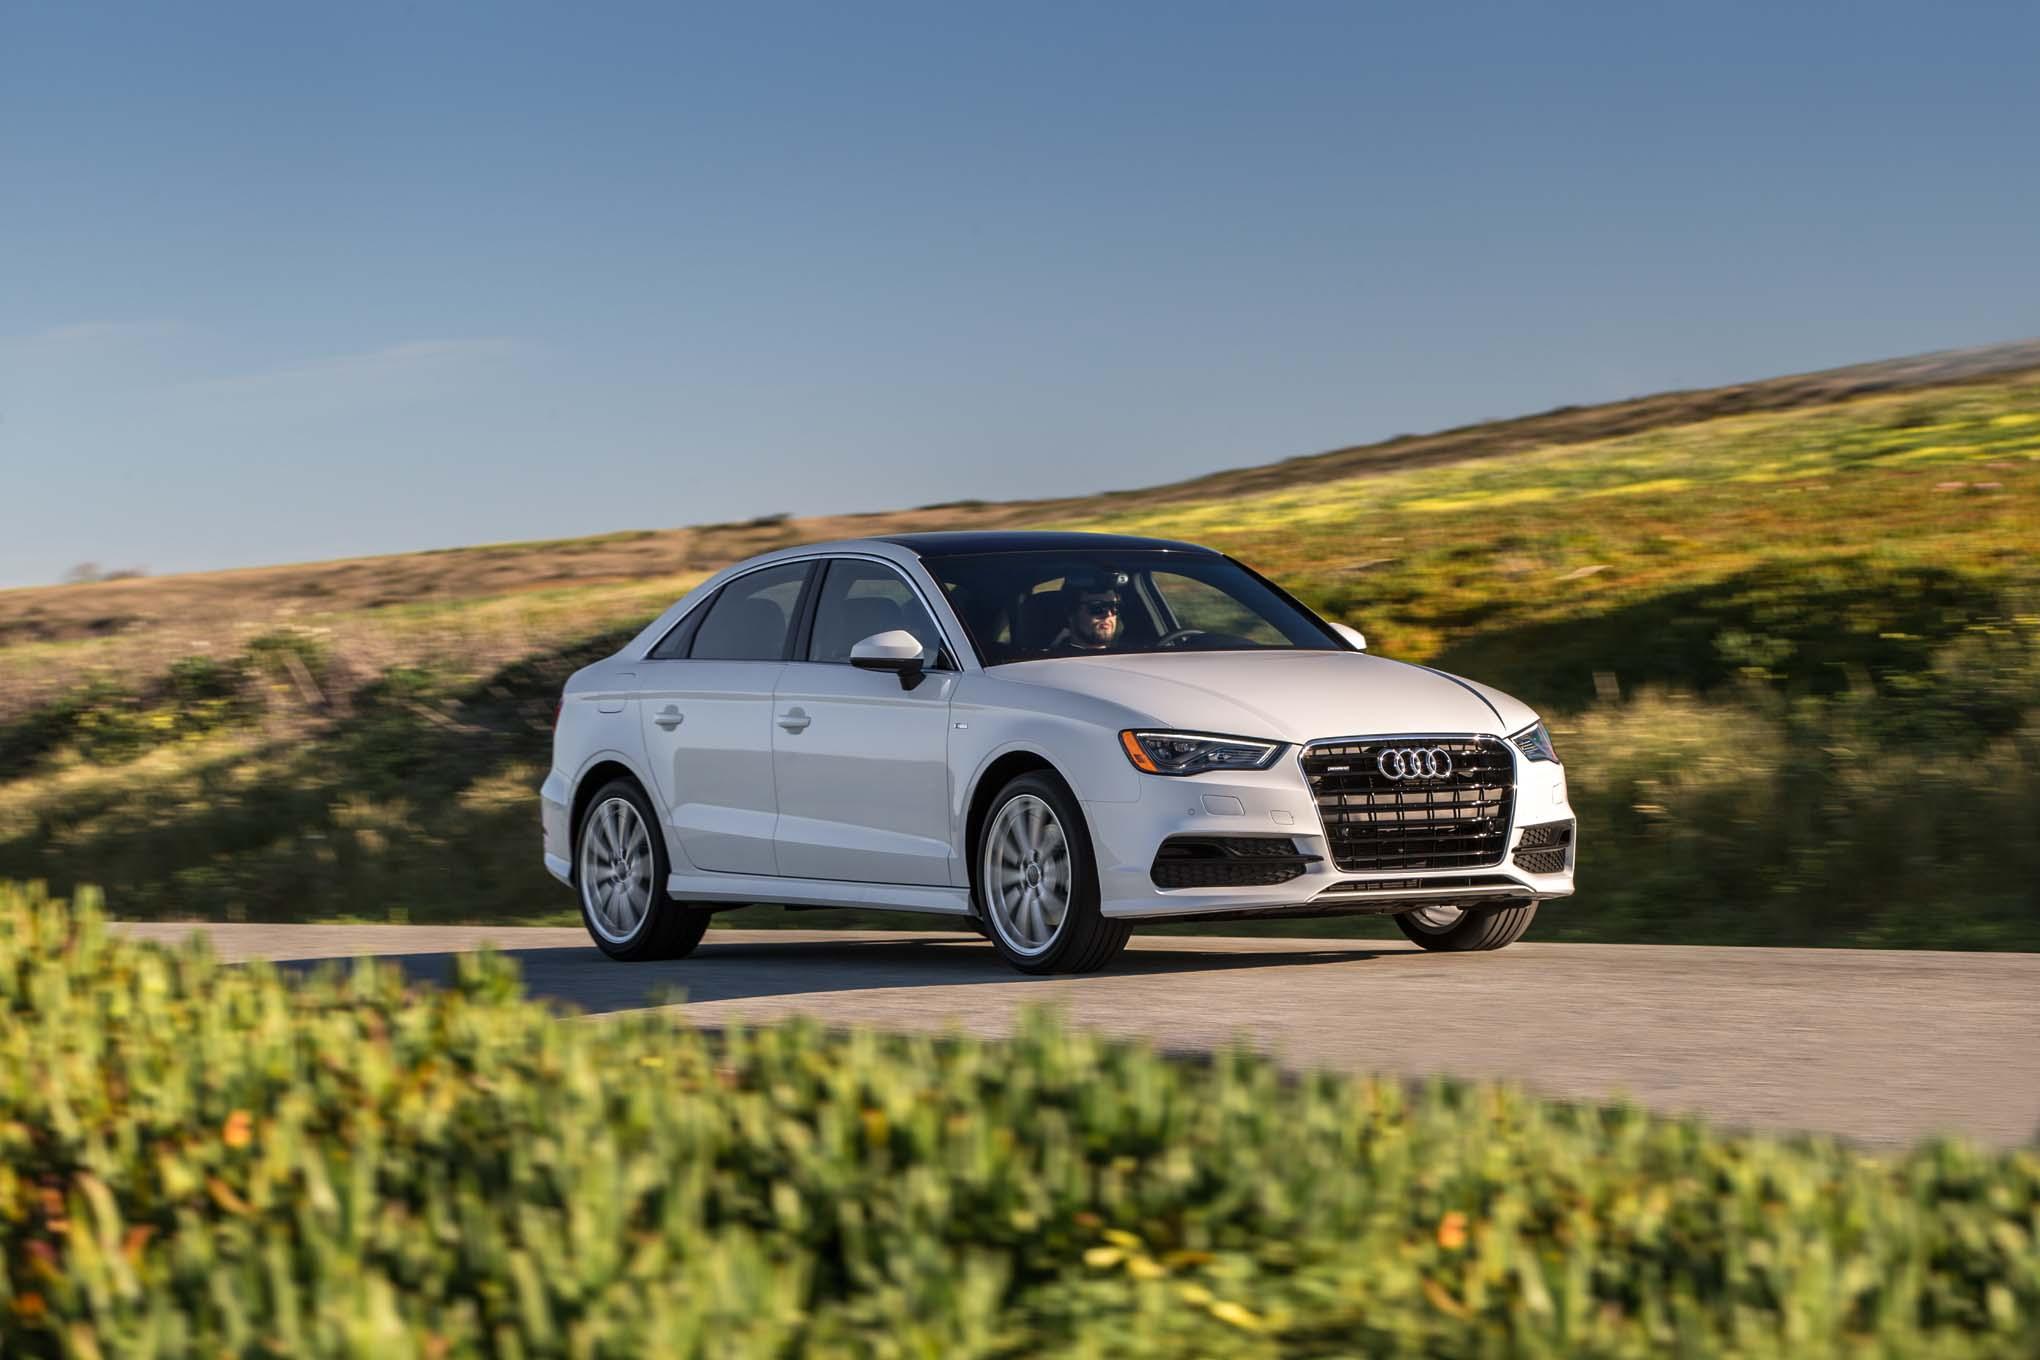 Audi Vs BMW Vs MercedesBenz In The Modern Era - Audi vs bmw